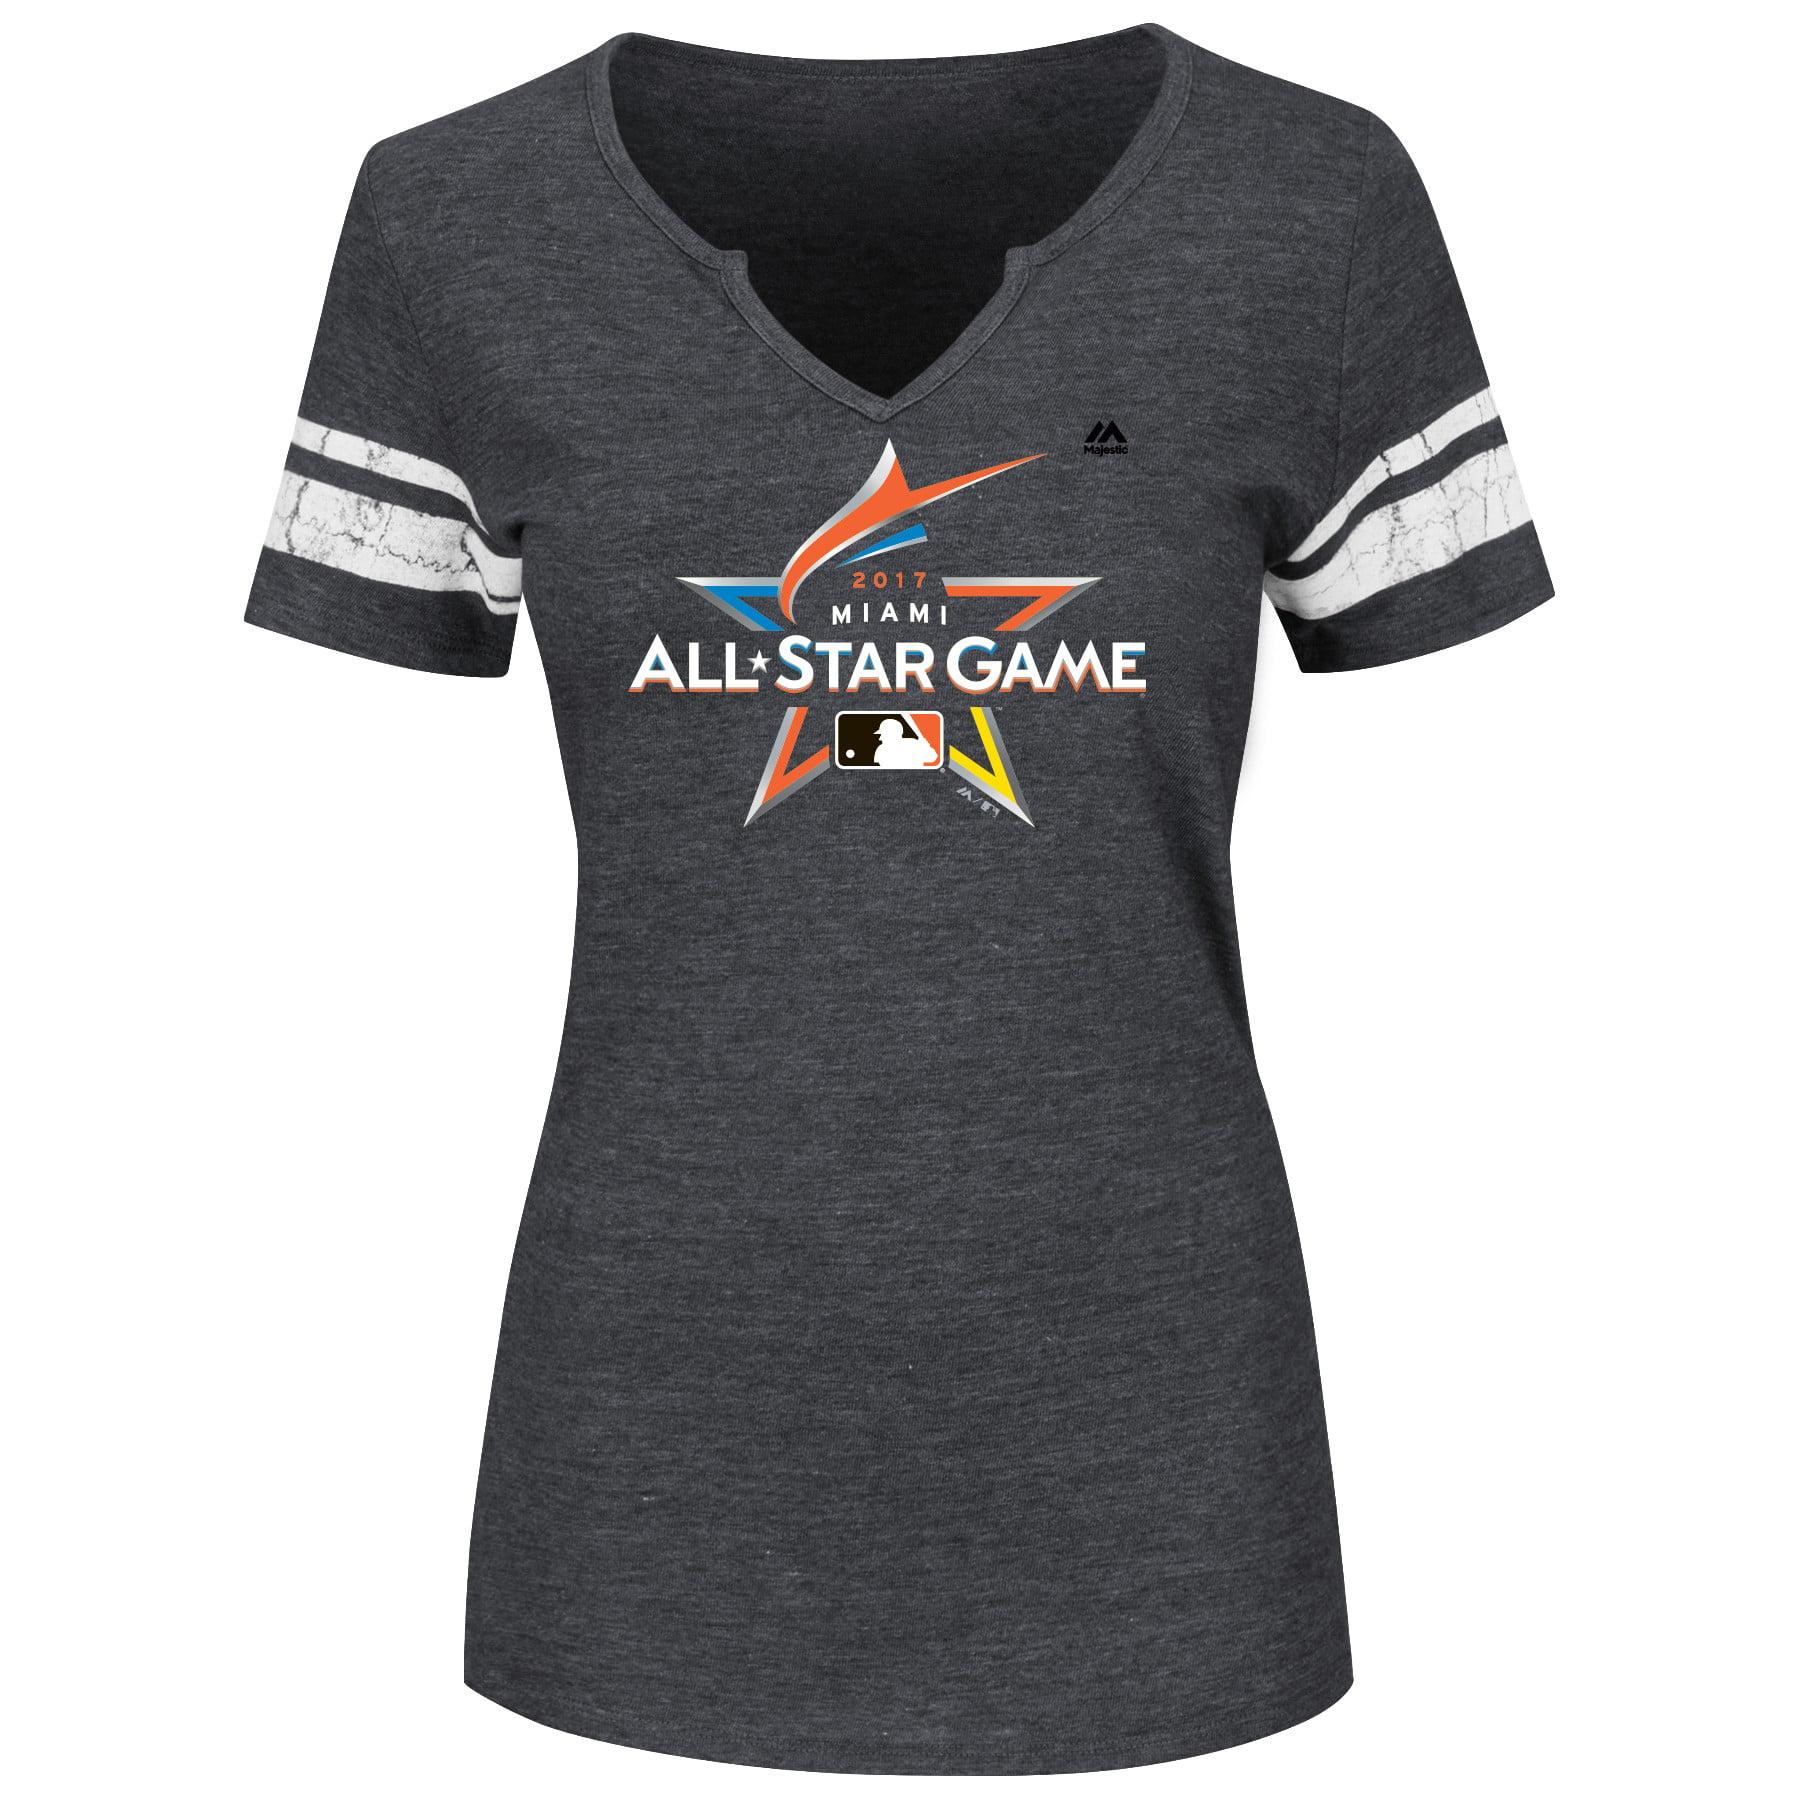 Majestic Women's 2017 MLB All-Star Game Notch V-Neck T-Shirt - Gray